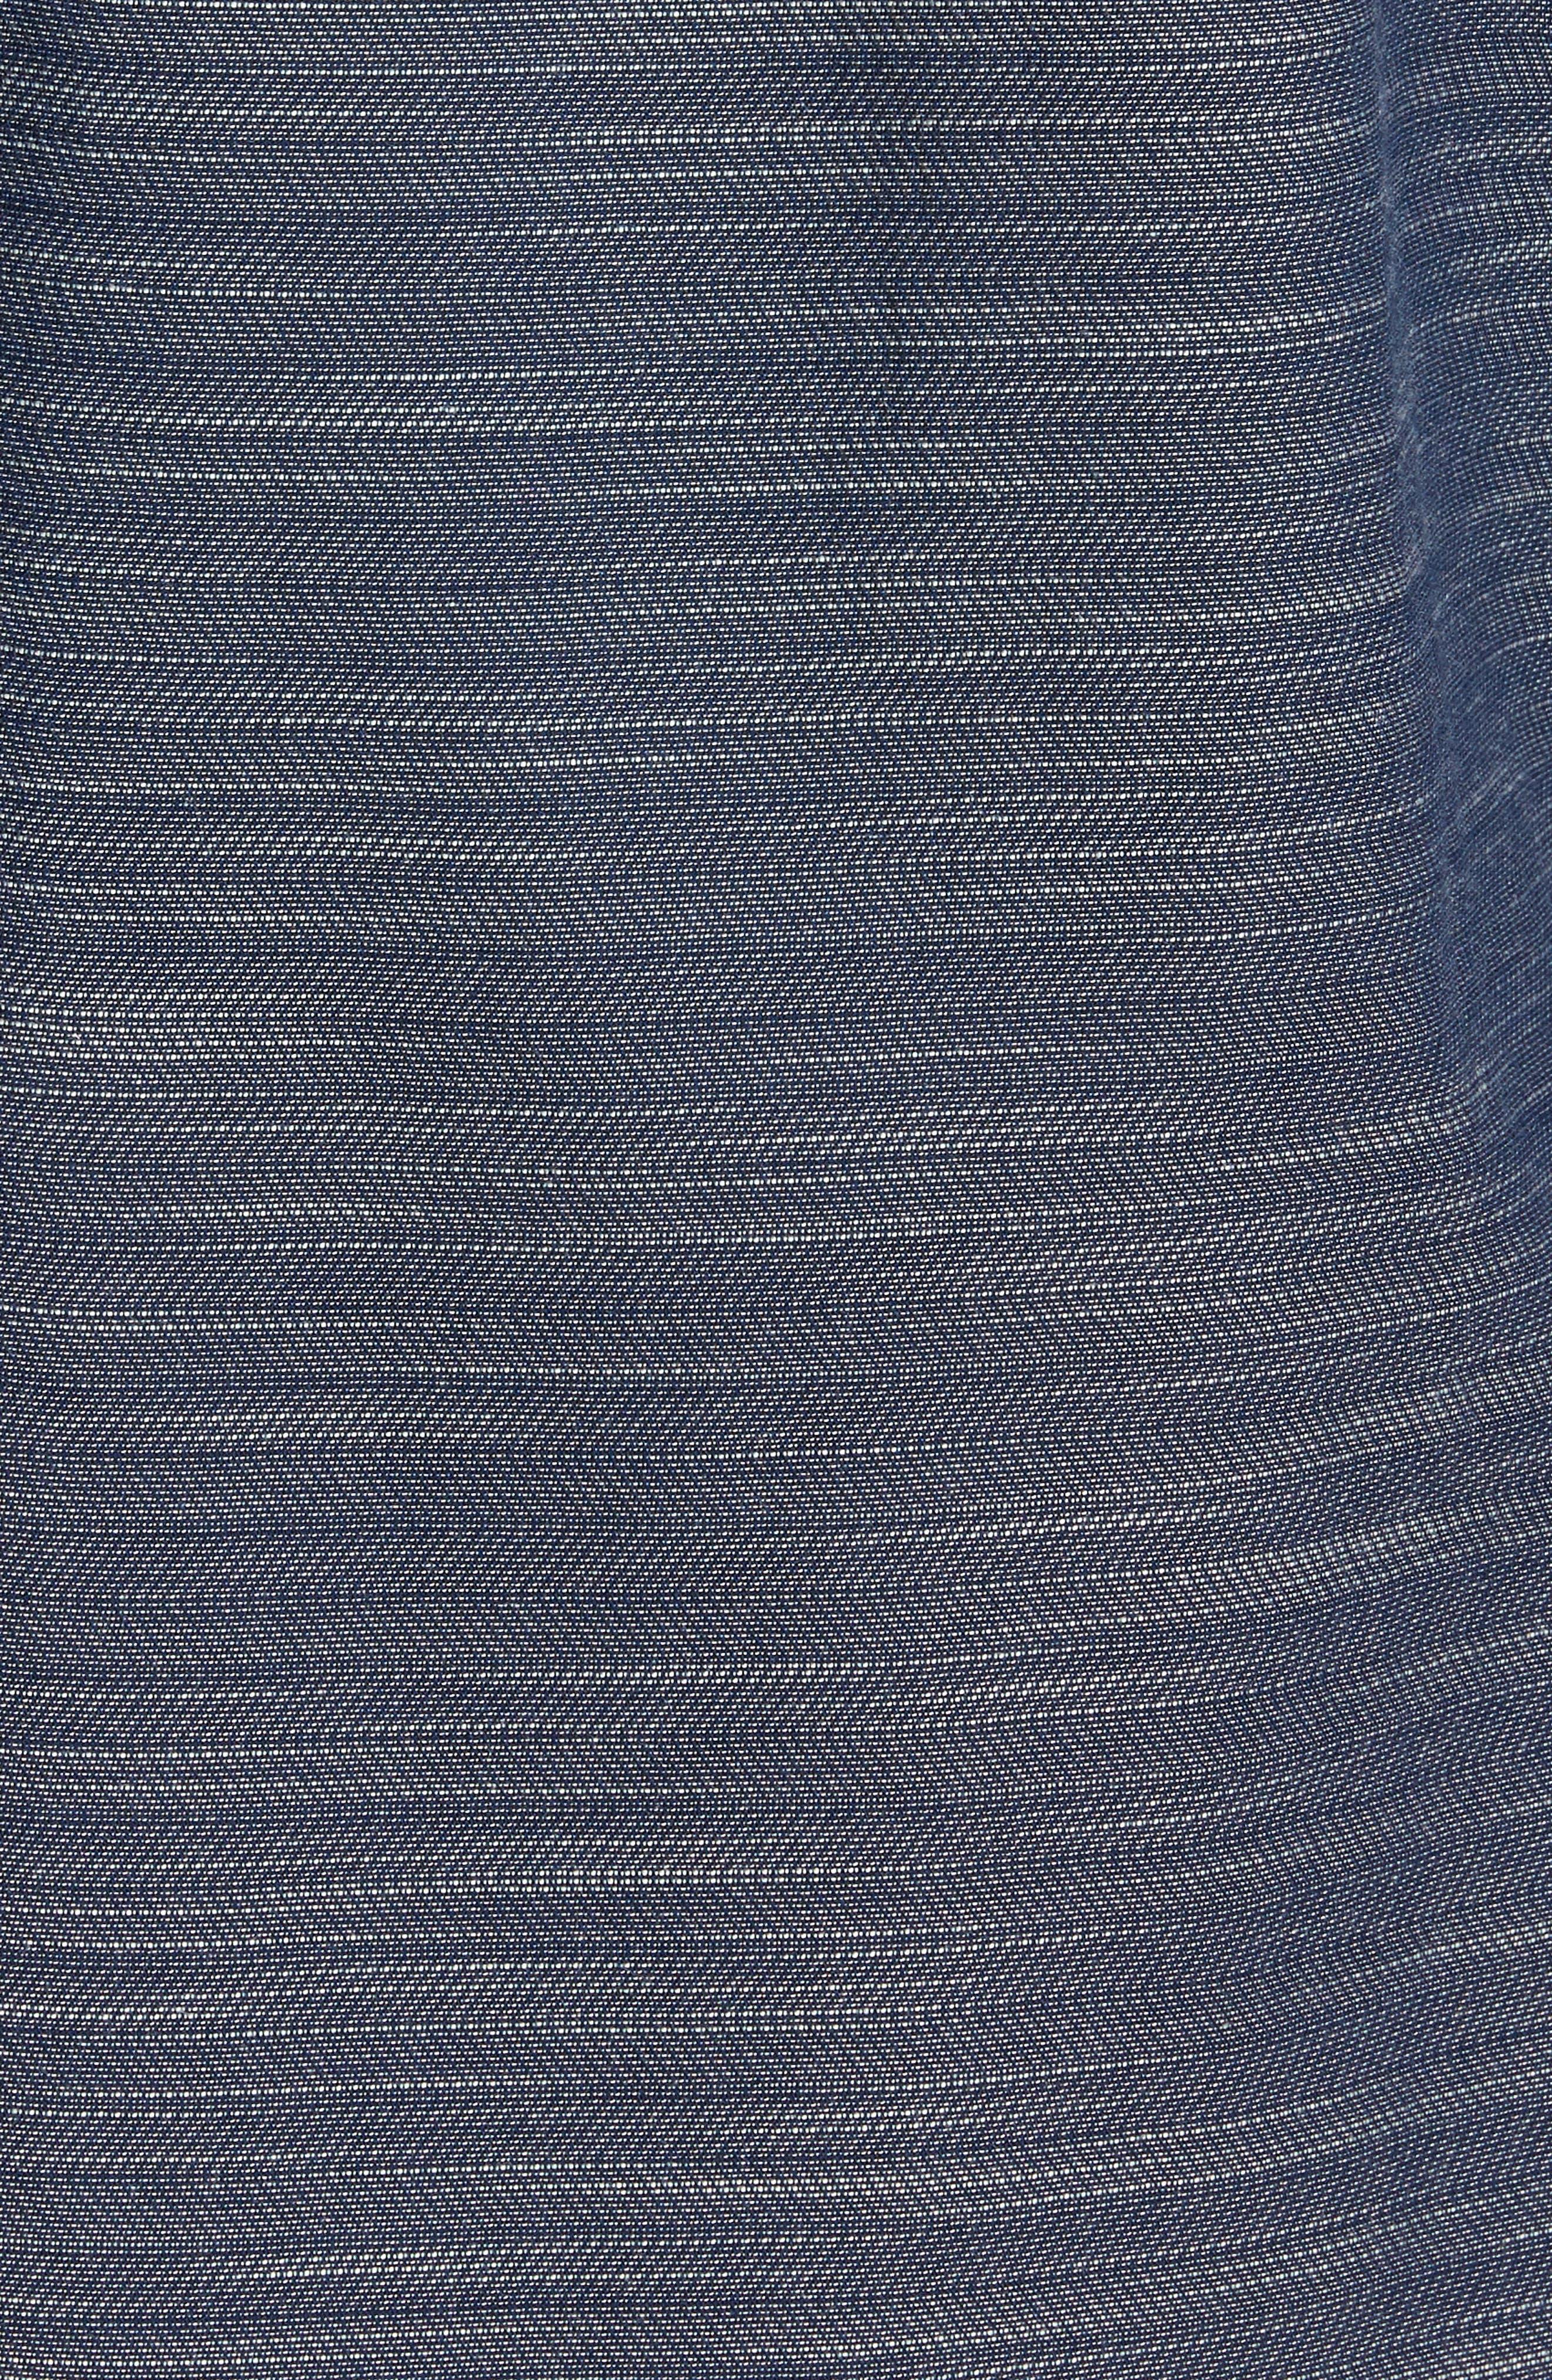 Herringbone Chambray Shirt,                             Alternate thumbnail 5, color,                             Navy Charcoal Herringbone